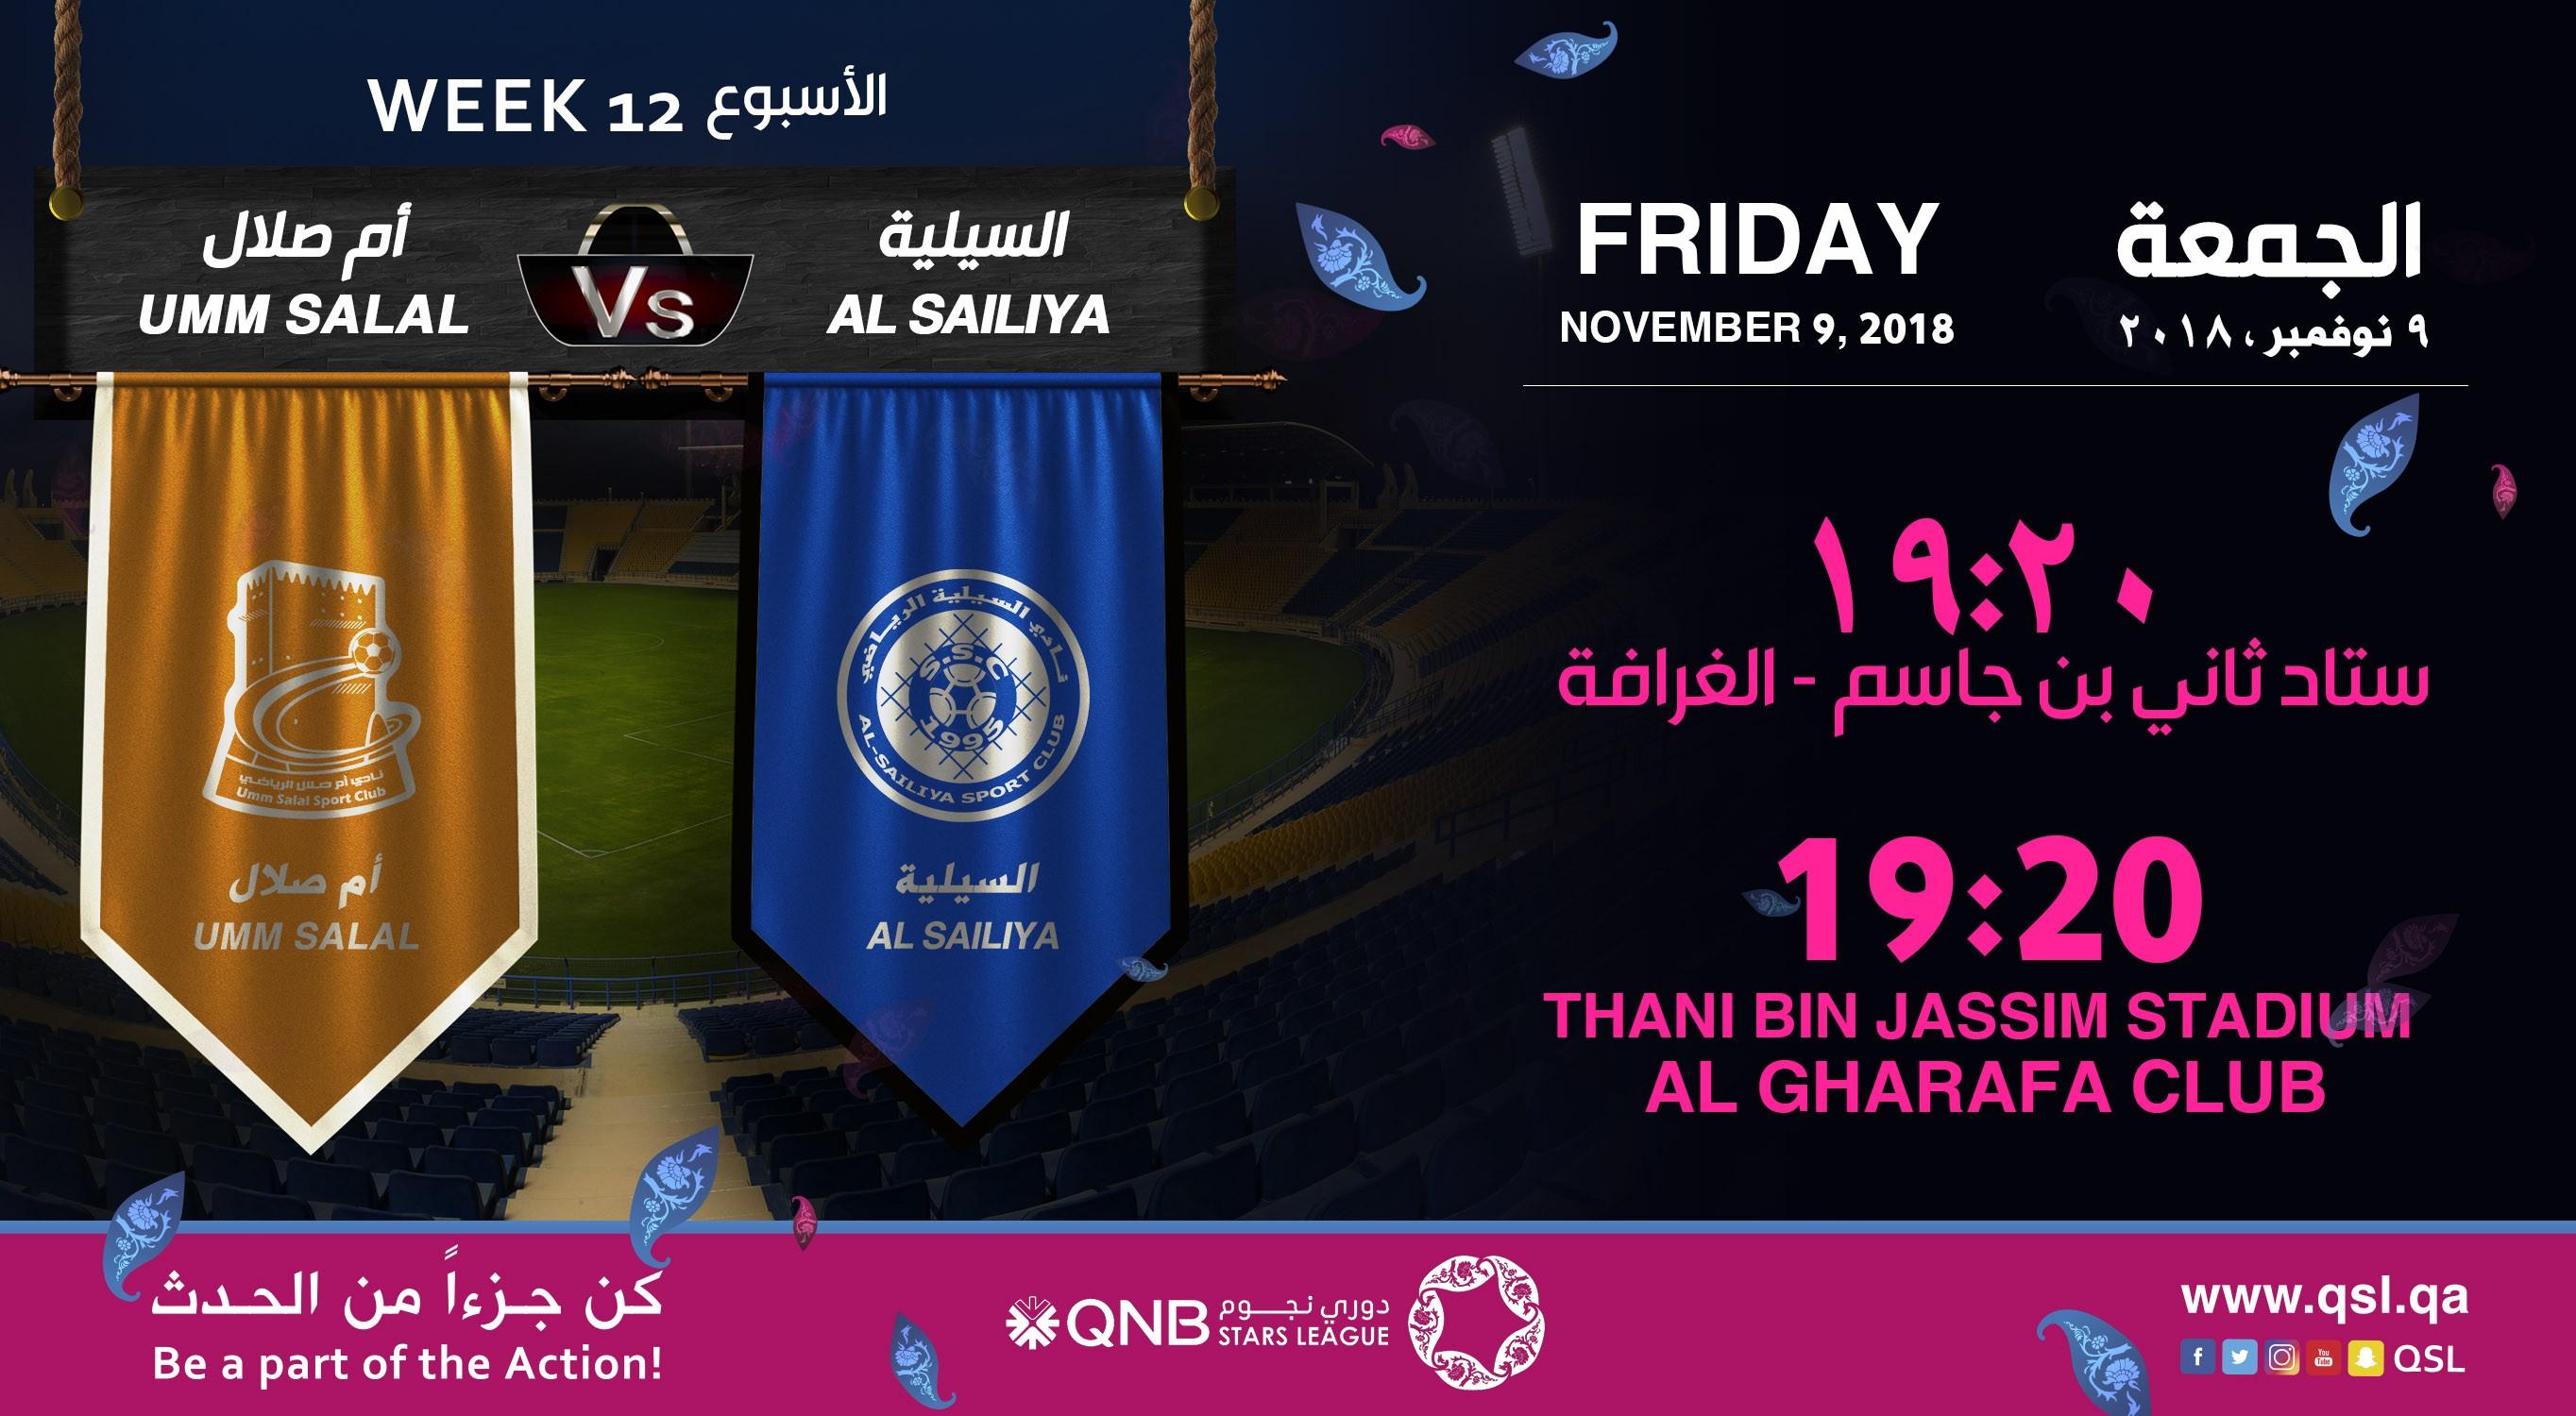 QNB Stars League Week 12 — Umm Salal vs Al Sailiya